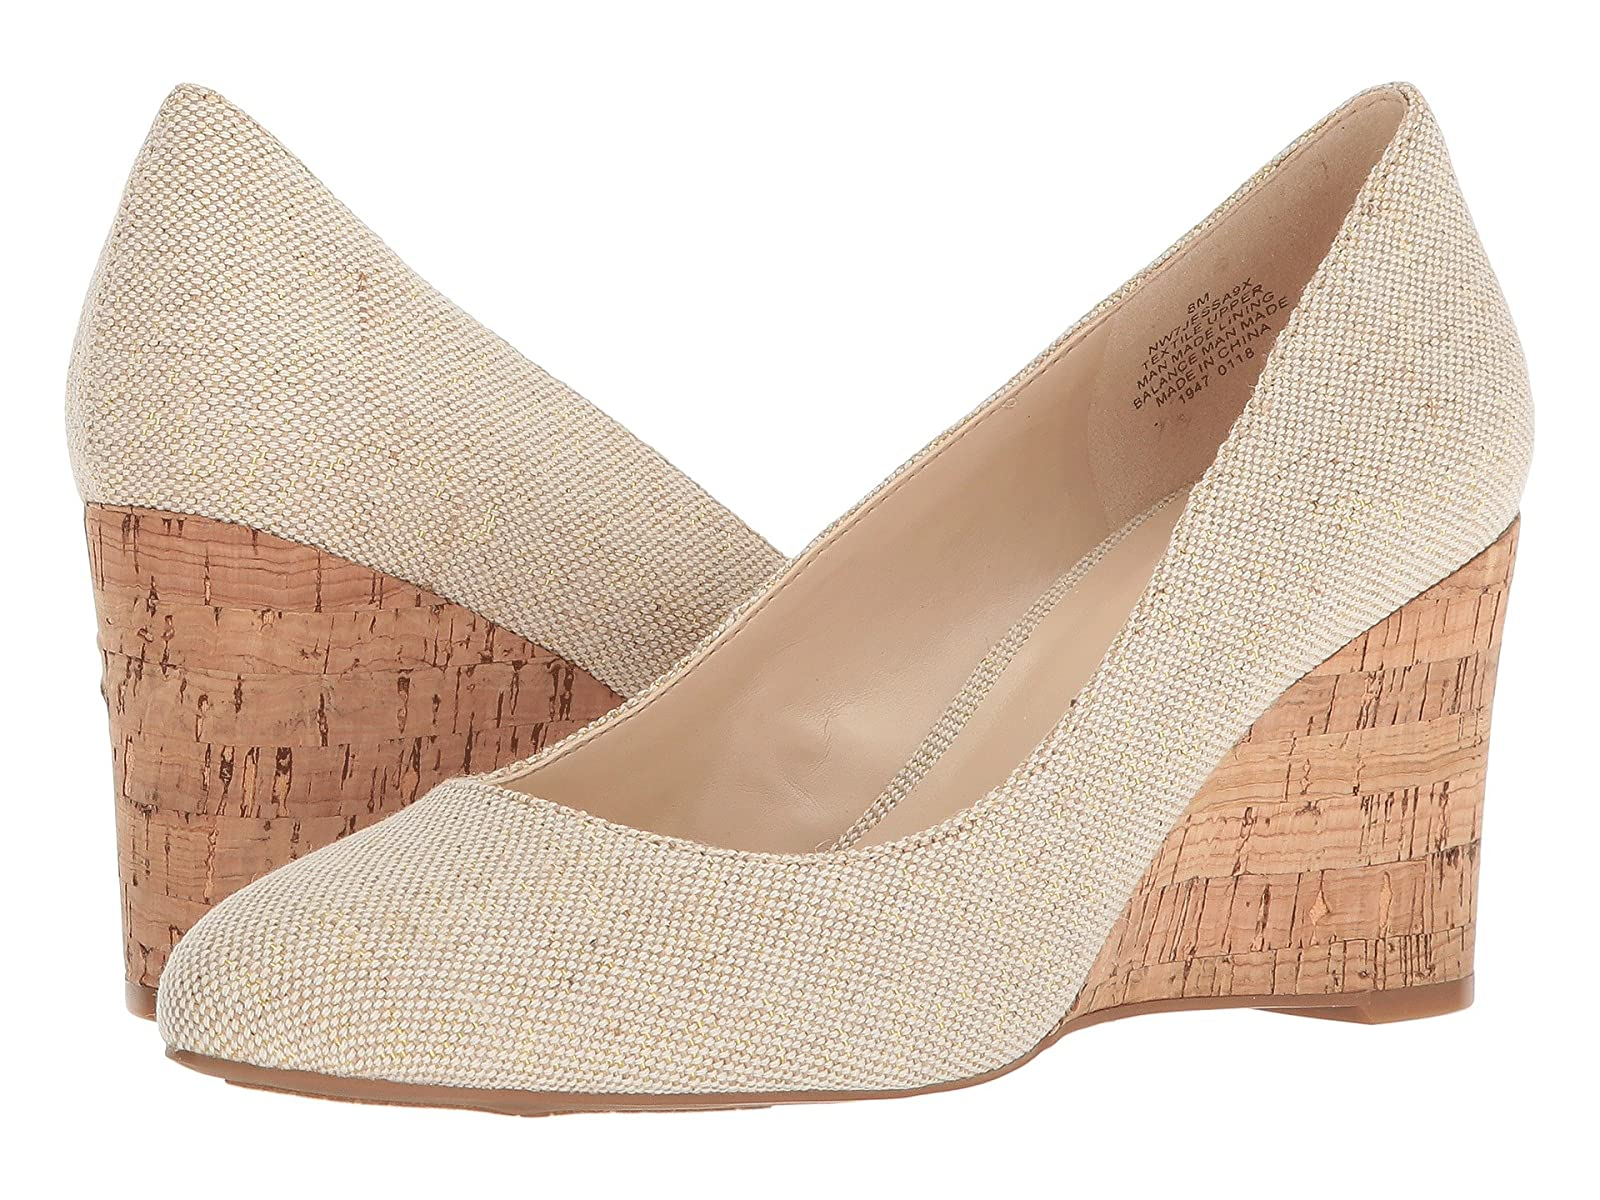 Nine West Jessa9XCheap and distinctive eye-catching shoes